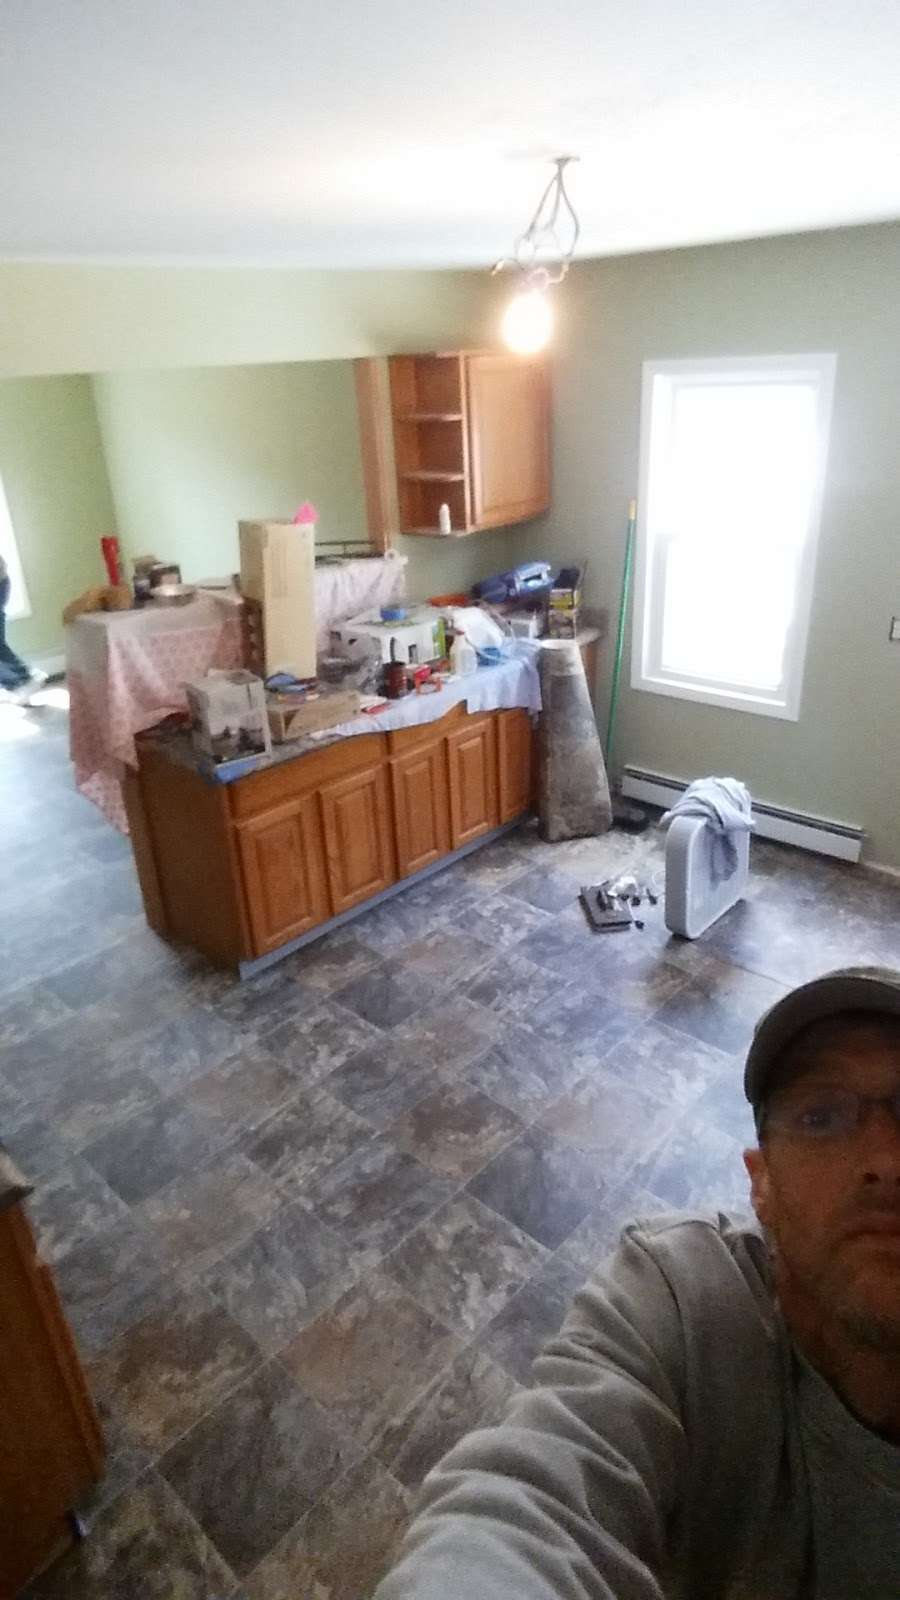 Godfrey Family Carpets - laundry    Photo 6 of 10   Address: 380 Daniel Webster Hwy, Merrimack, NH 03054, USA   Phone: (603) 647-0700